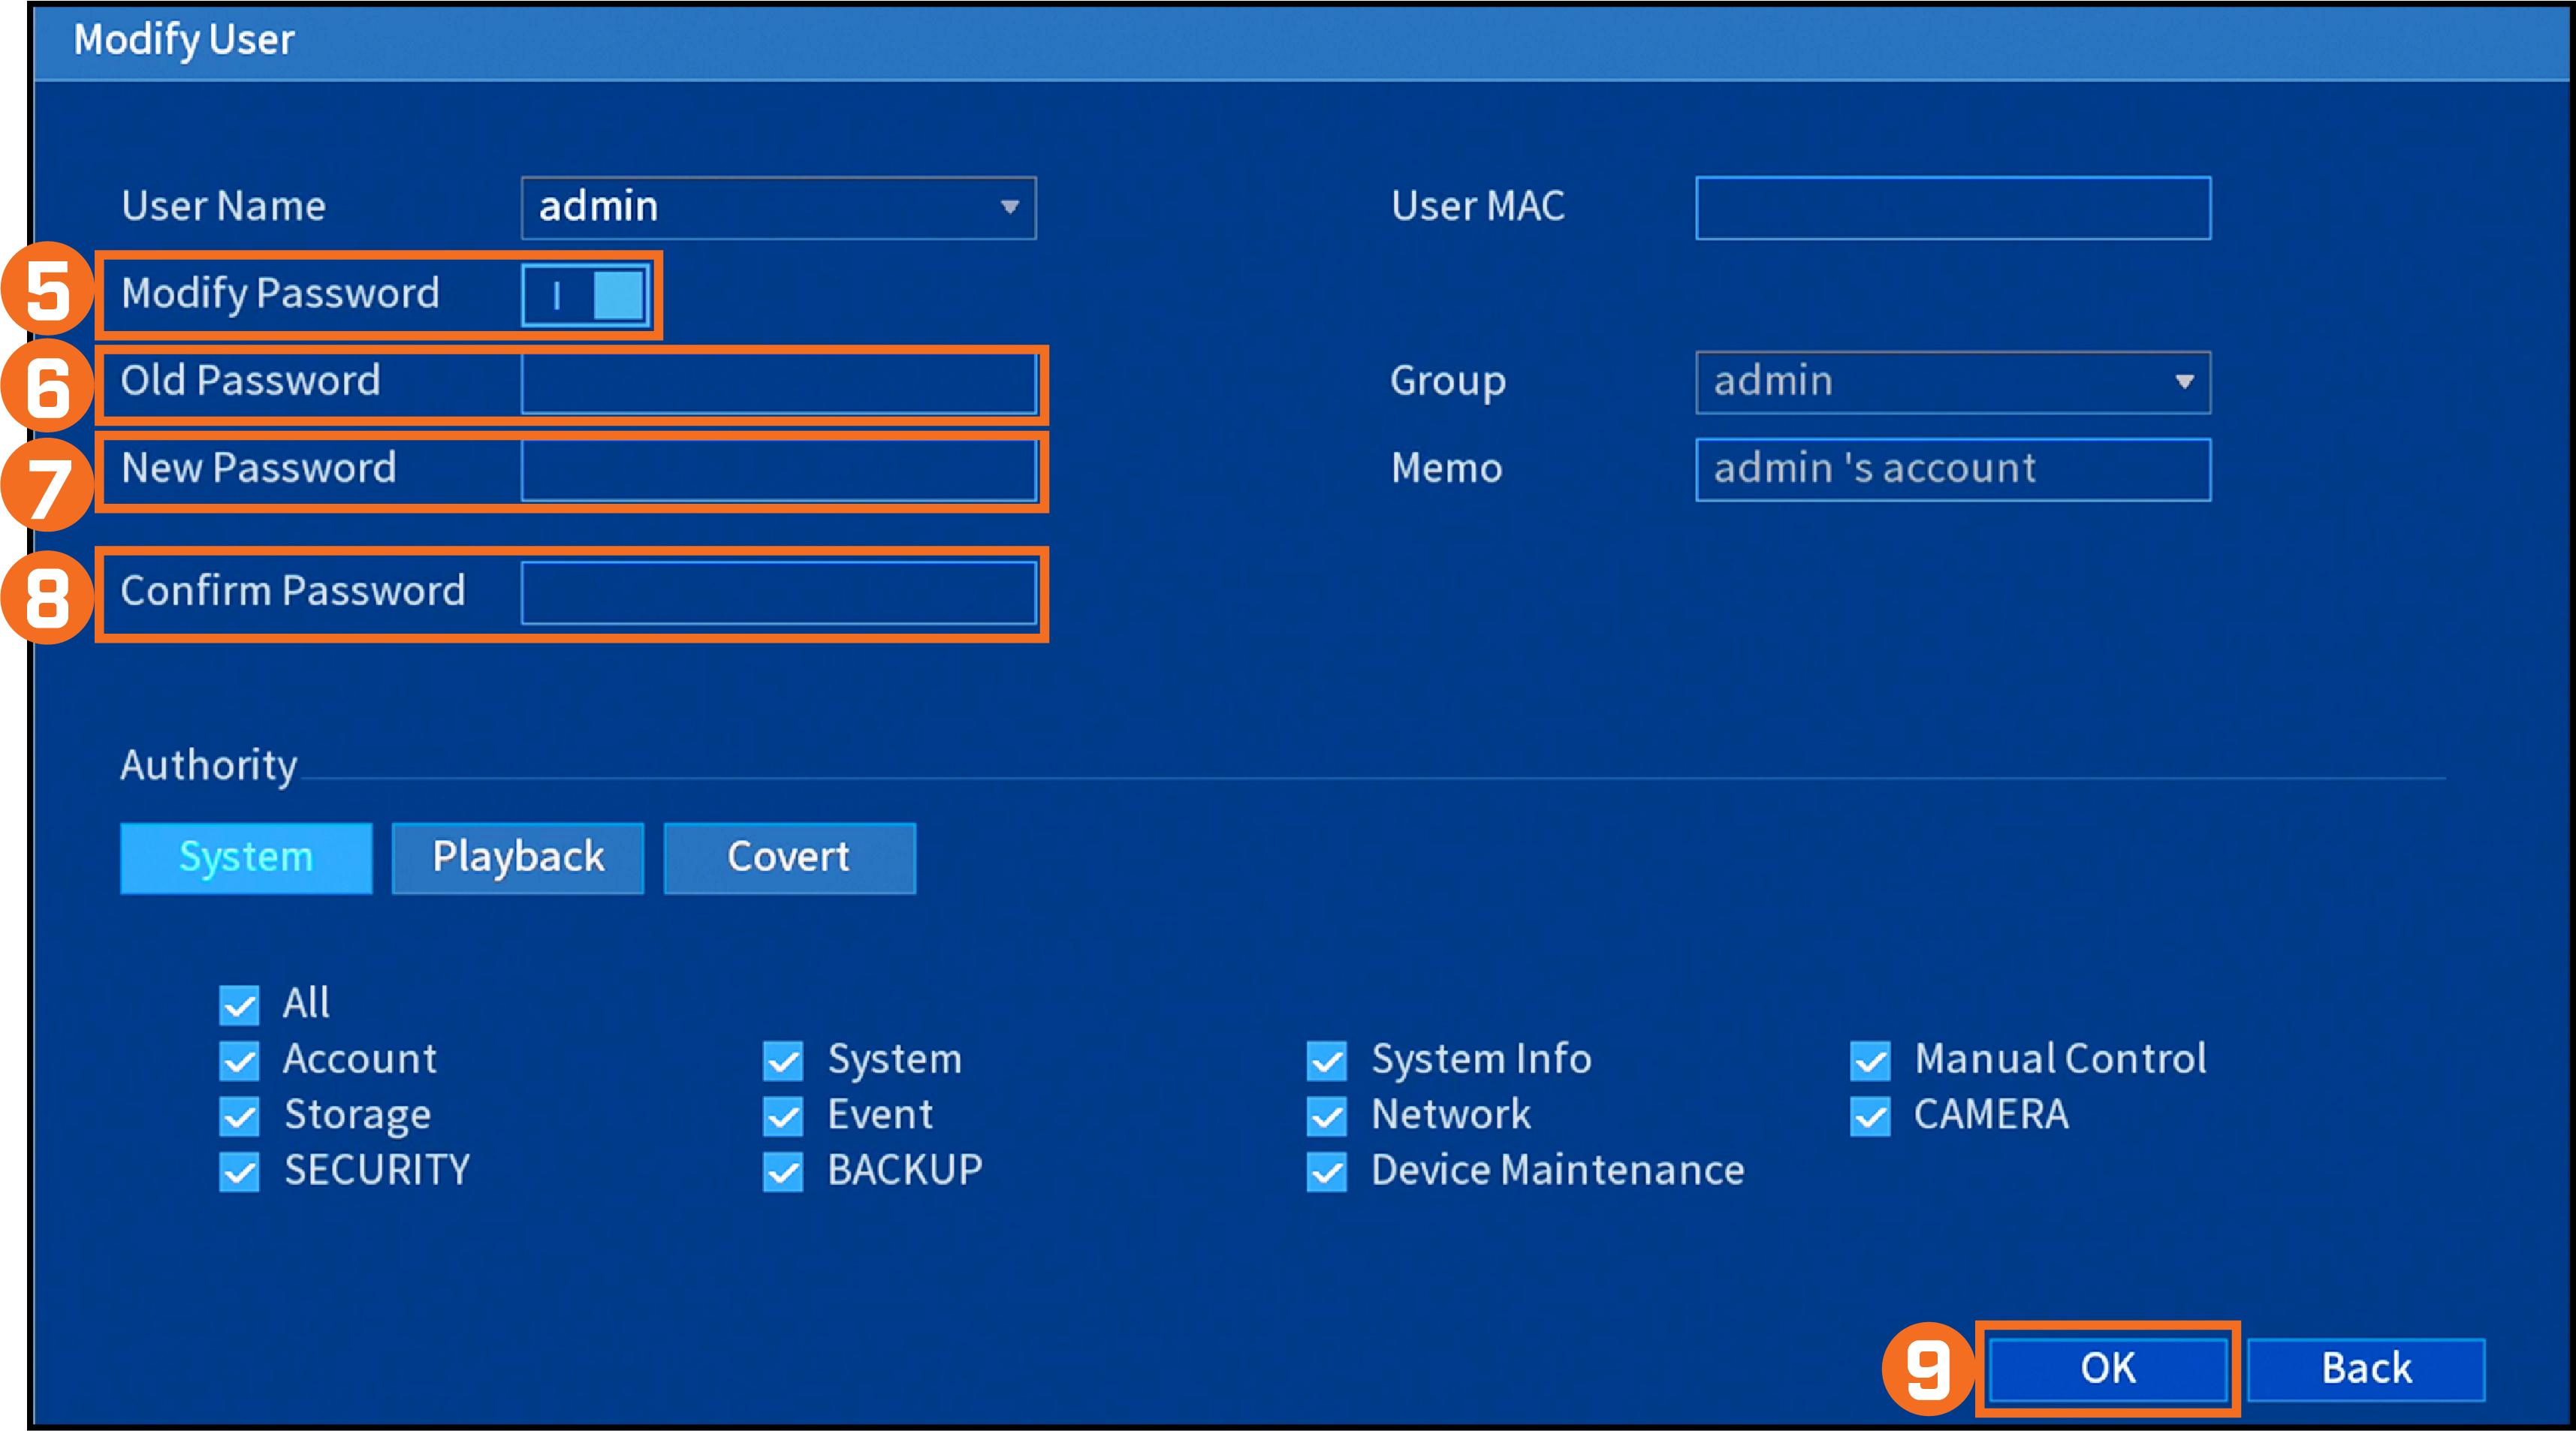 Modify User Settings